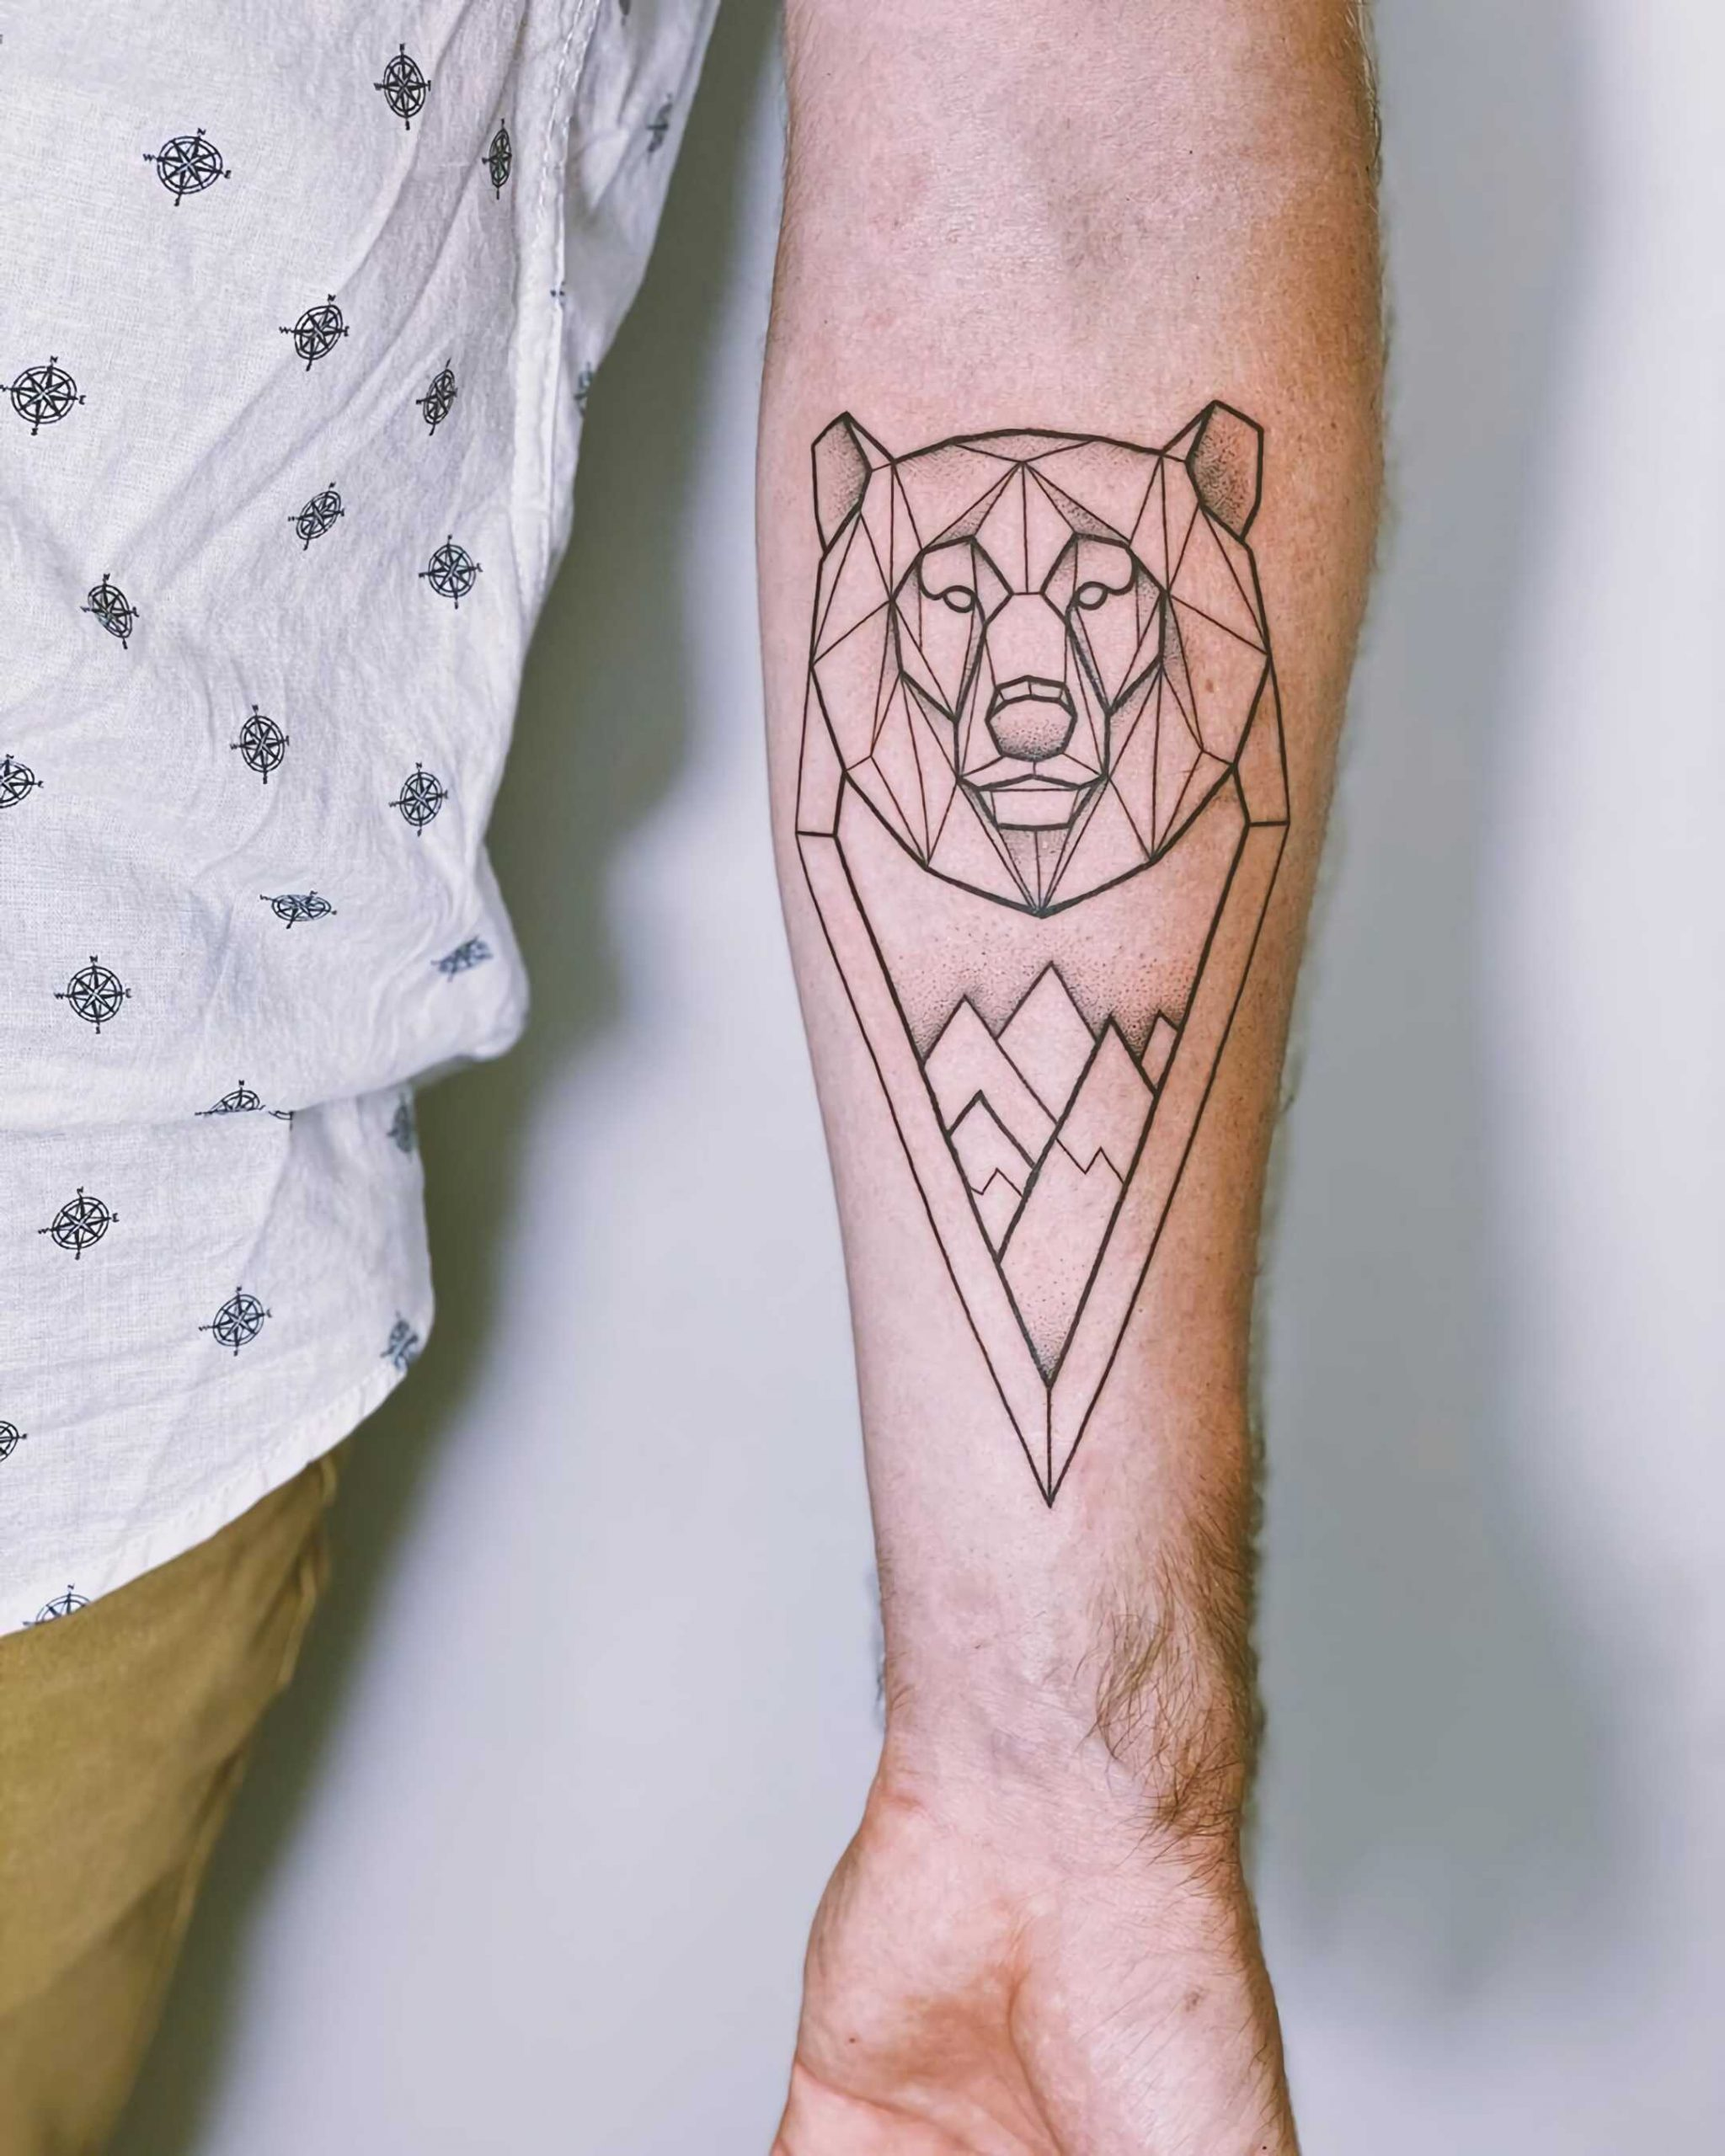 геометрическое тату медведя на руке